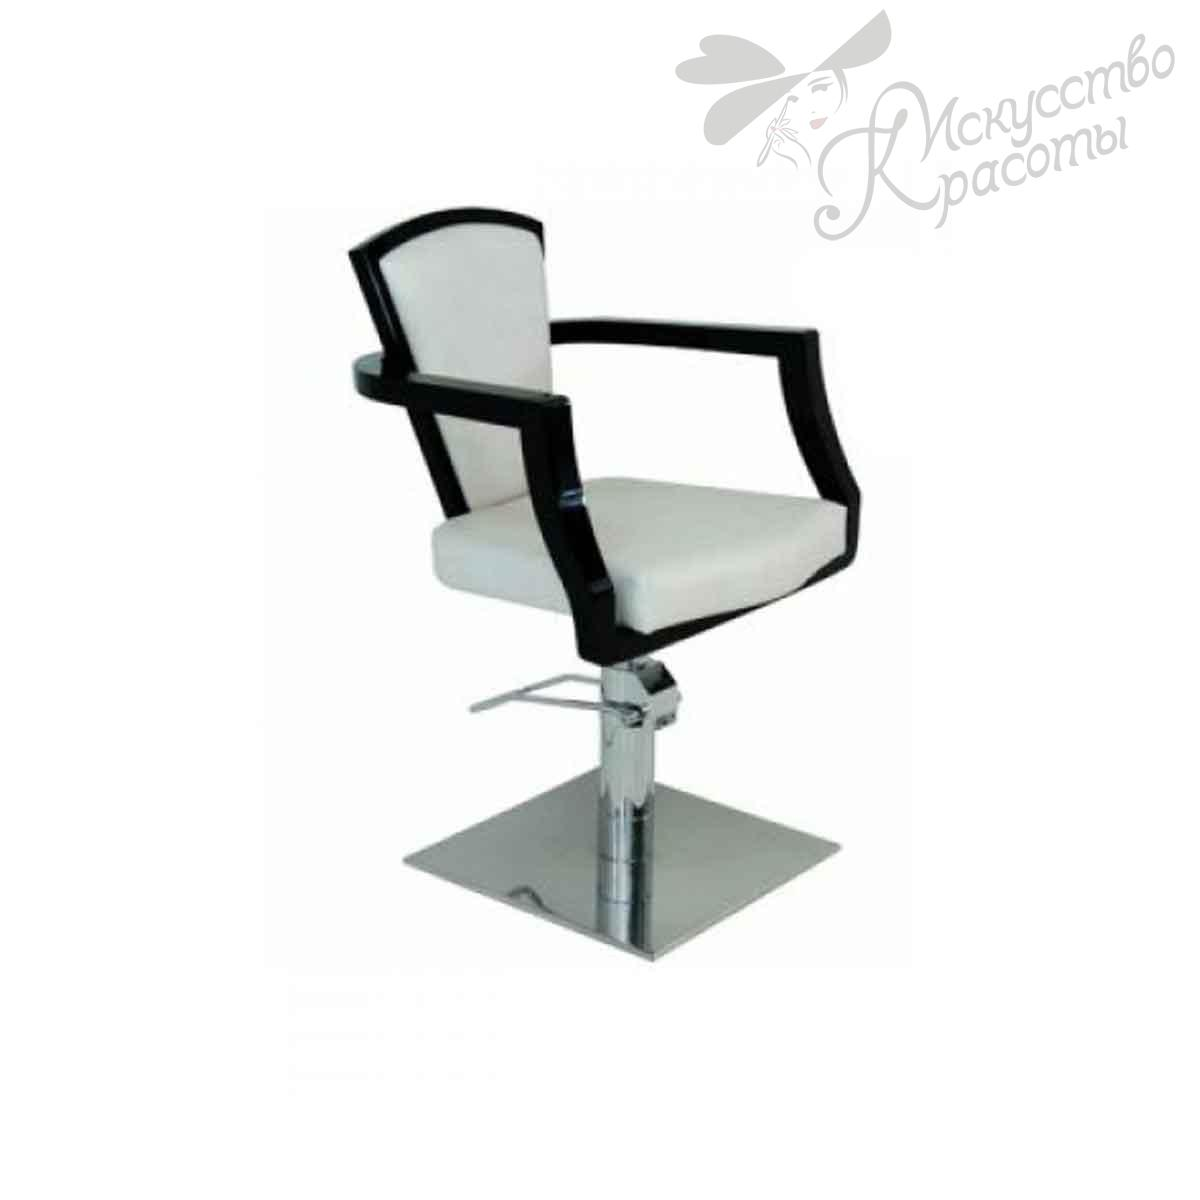 Парикмахерское кресло Кинг Люкс пневматика